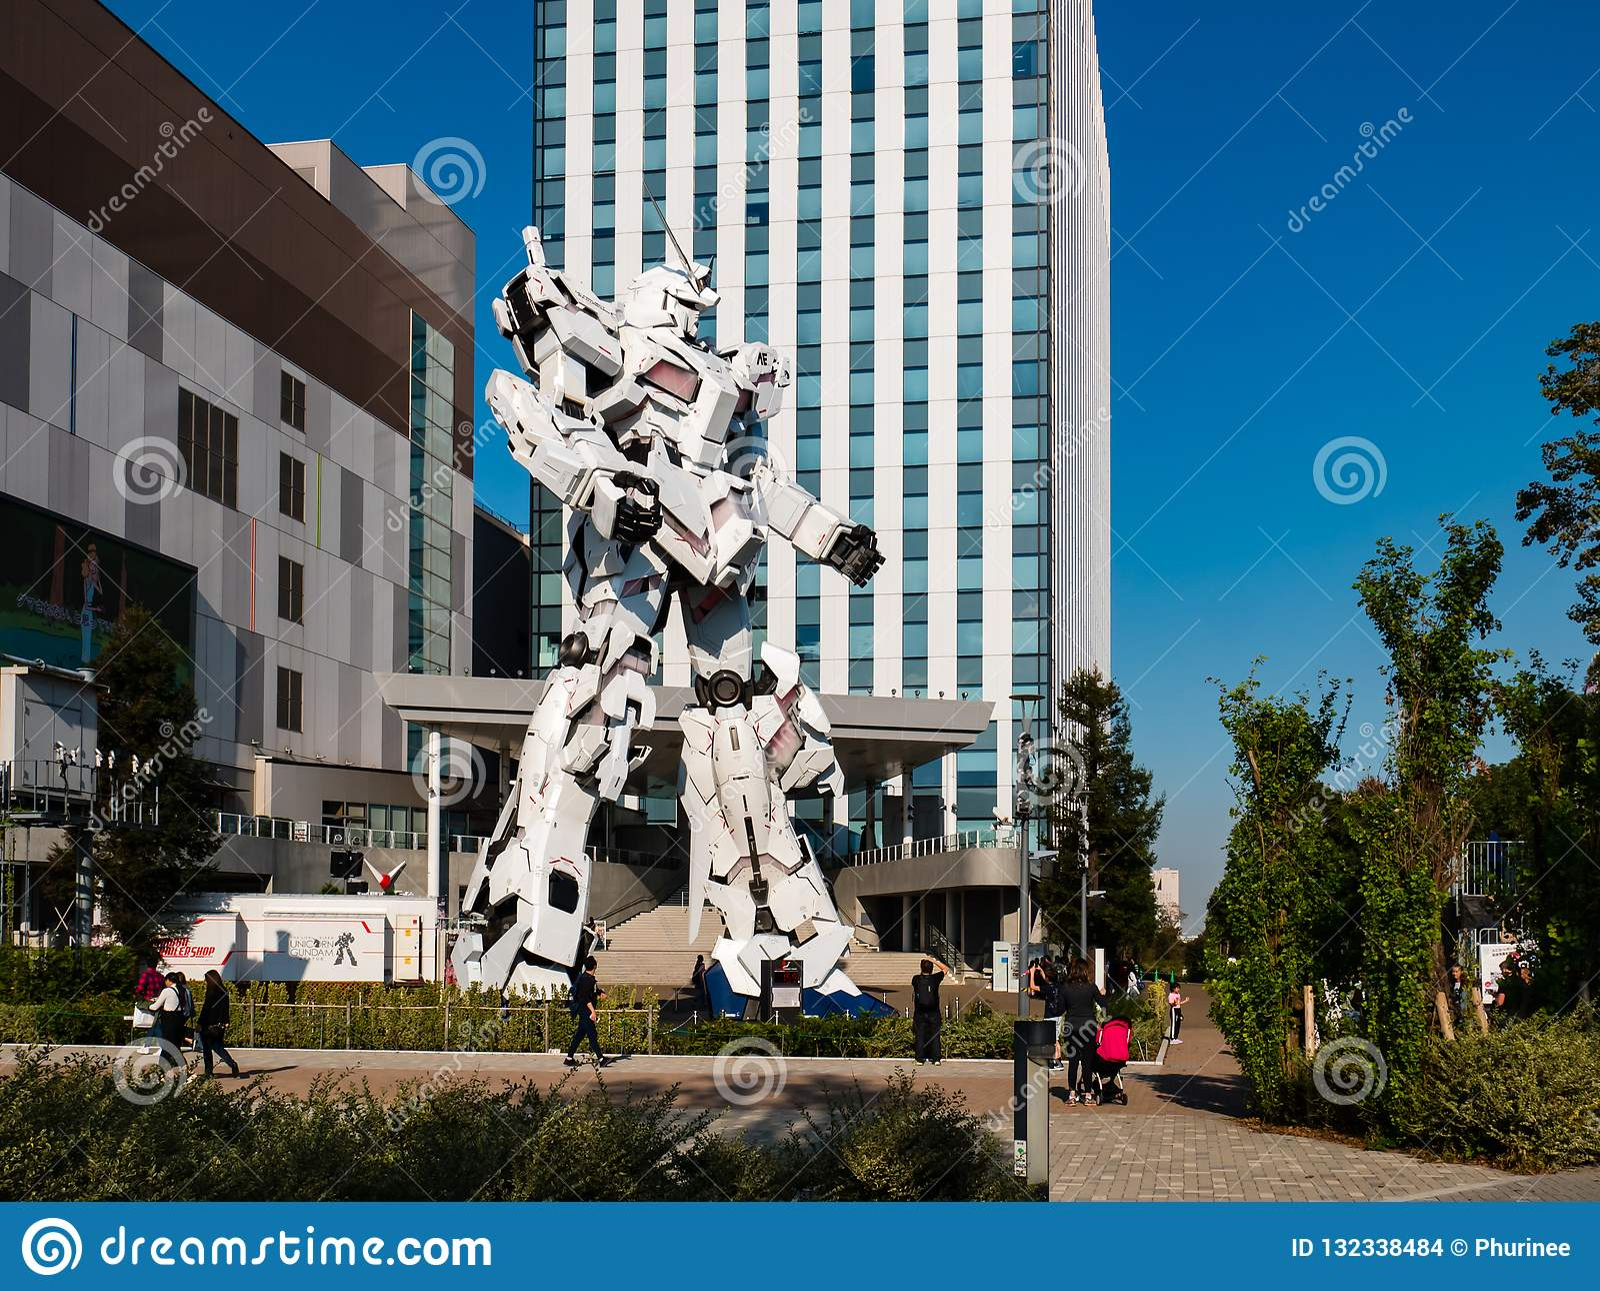 Full-size of RX-0 Unicorn Gundam at Diver City Tokyo Plaza in Od